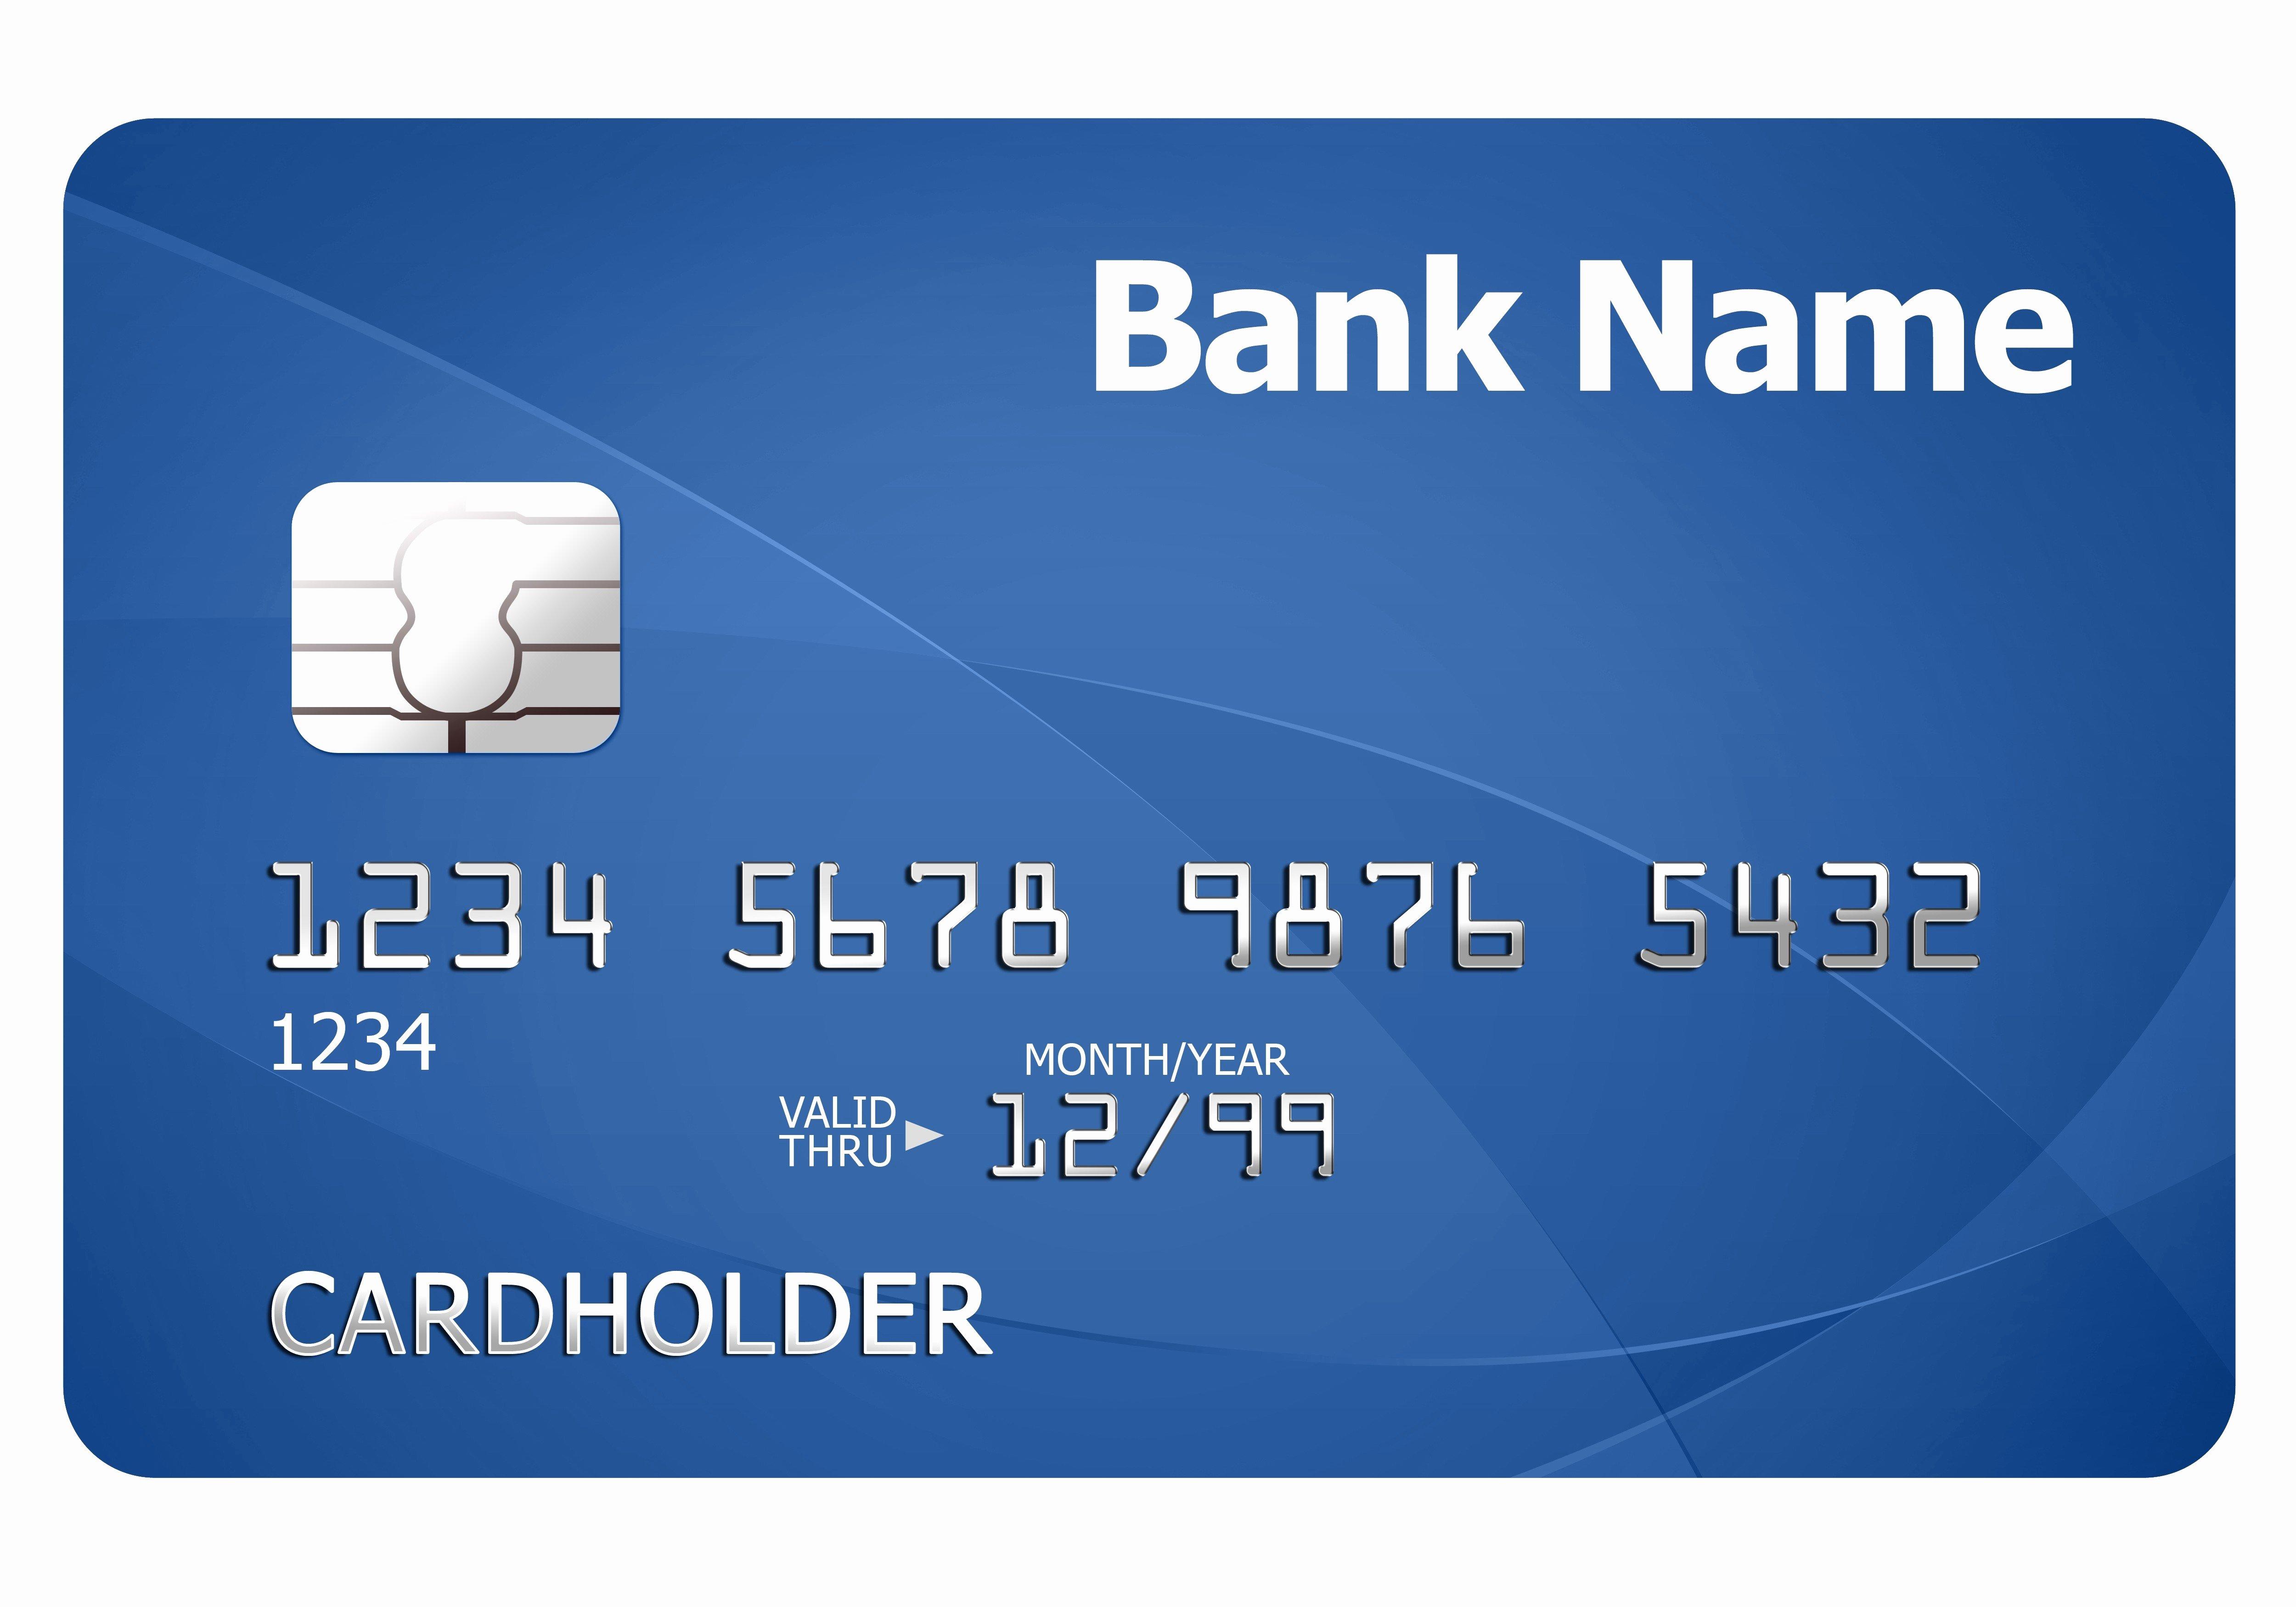 Cool Debit Card Designs New Regions Lost Debit Card Best Cards for You